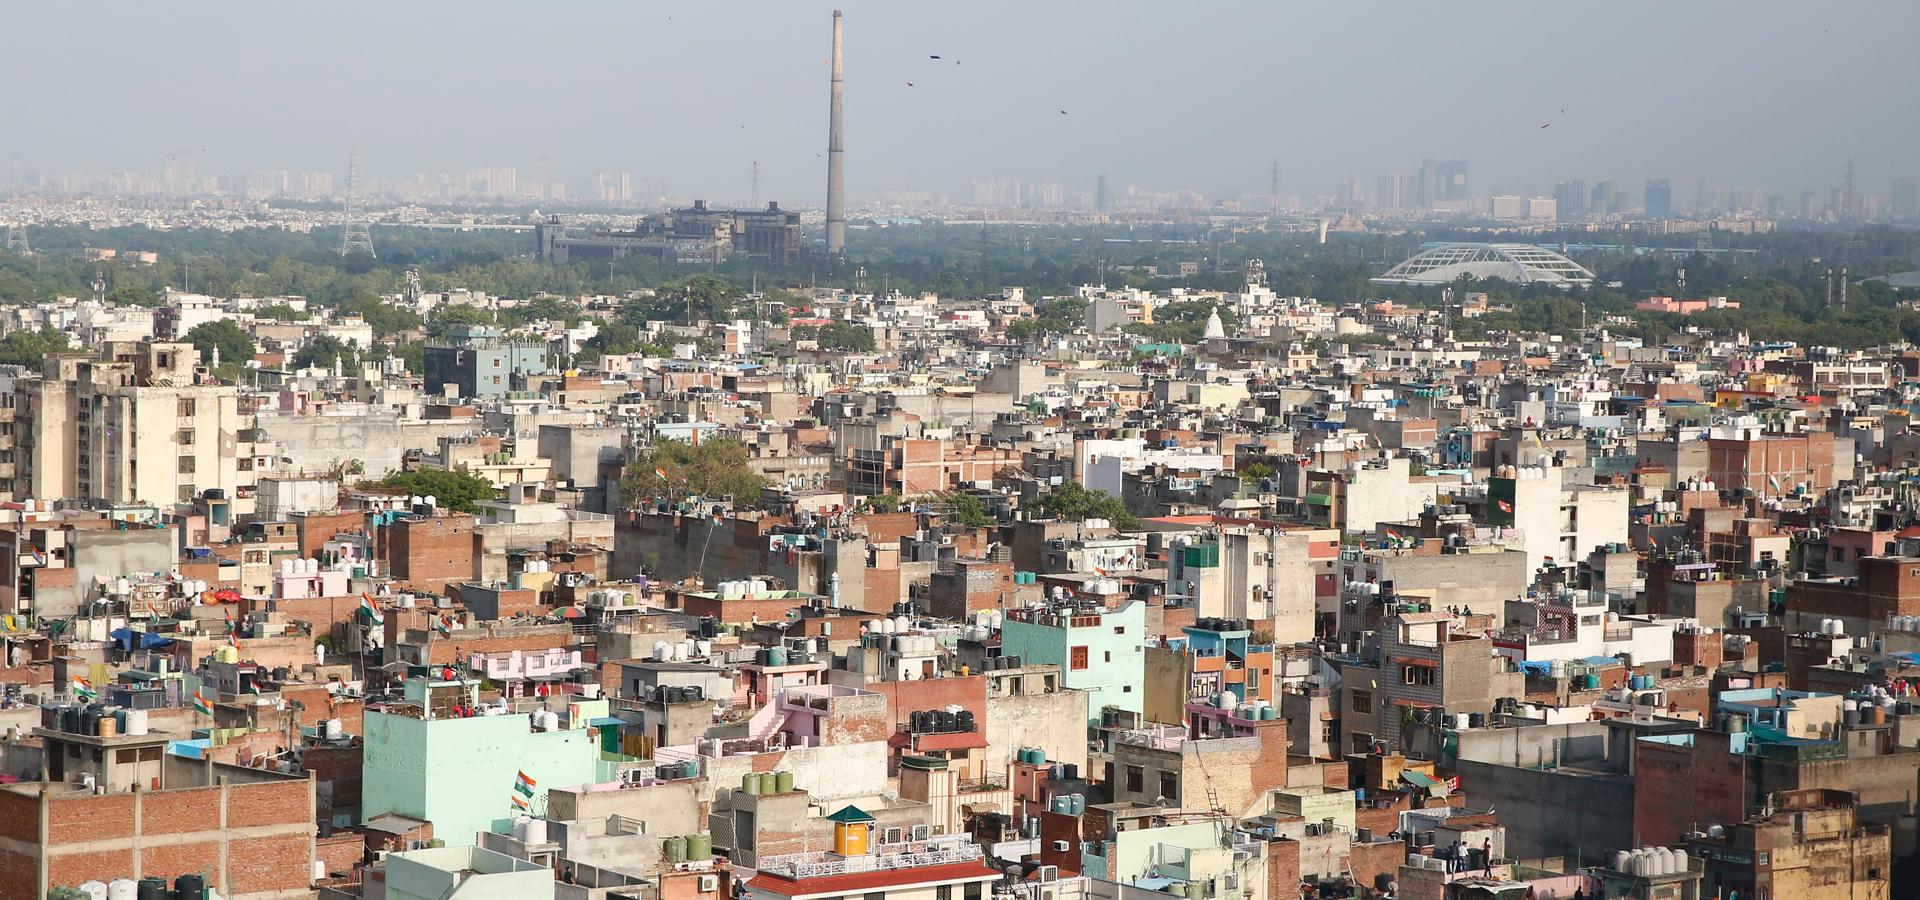 Peer-to-peer advisory in New Delhi, India